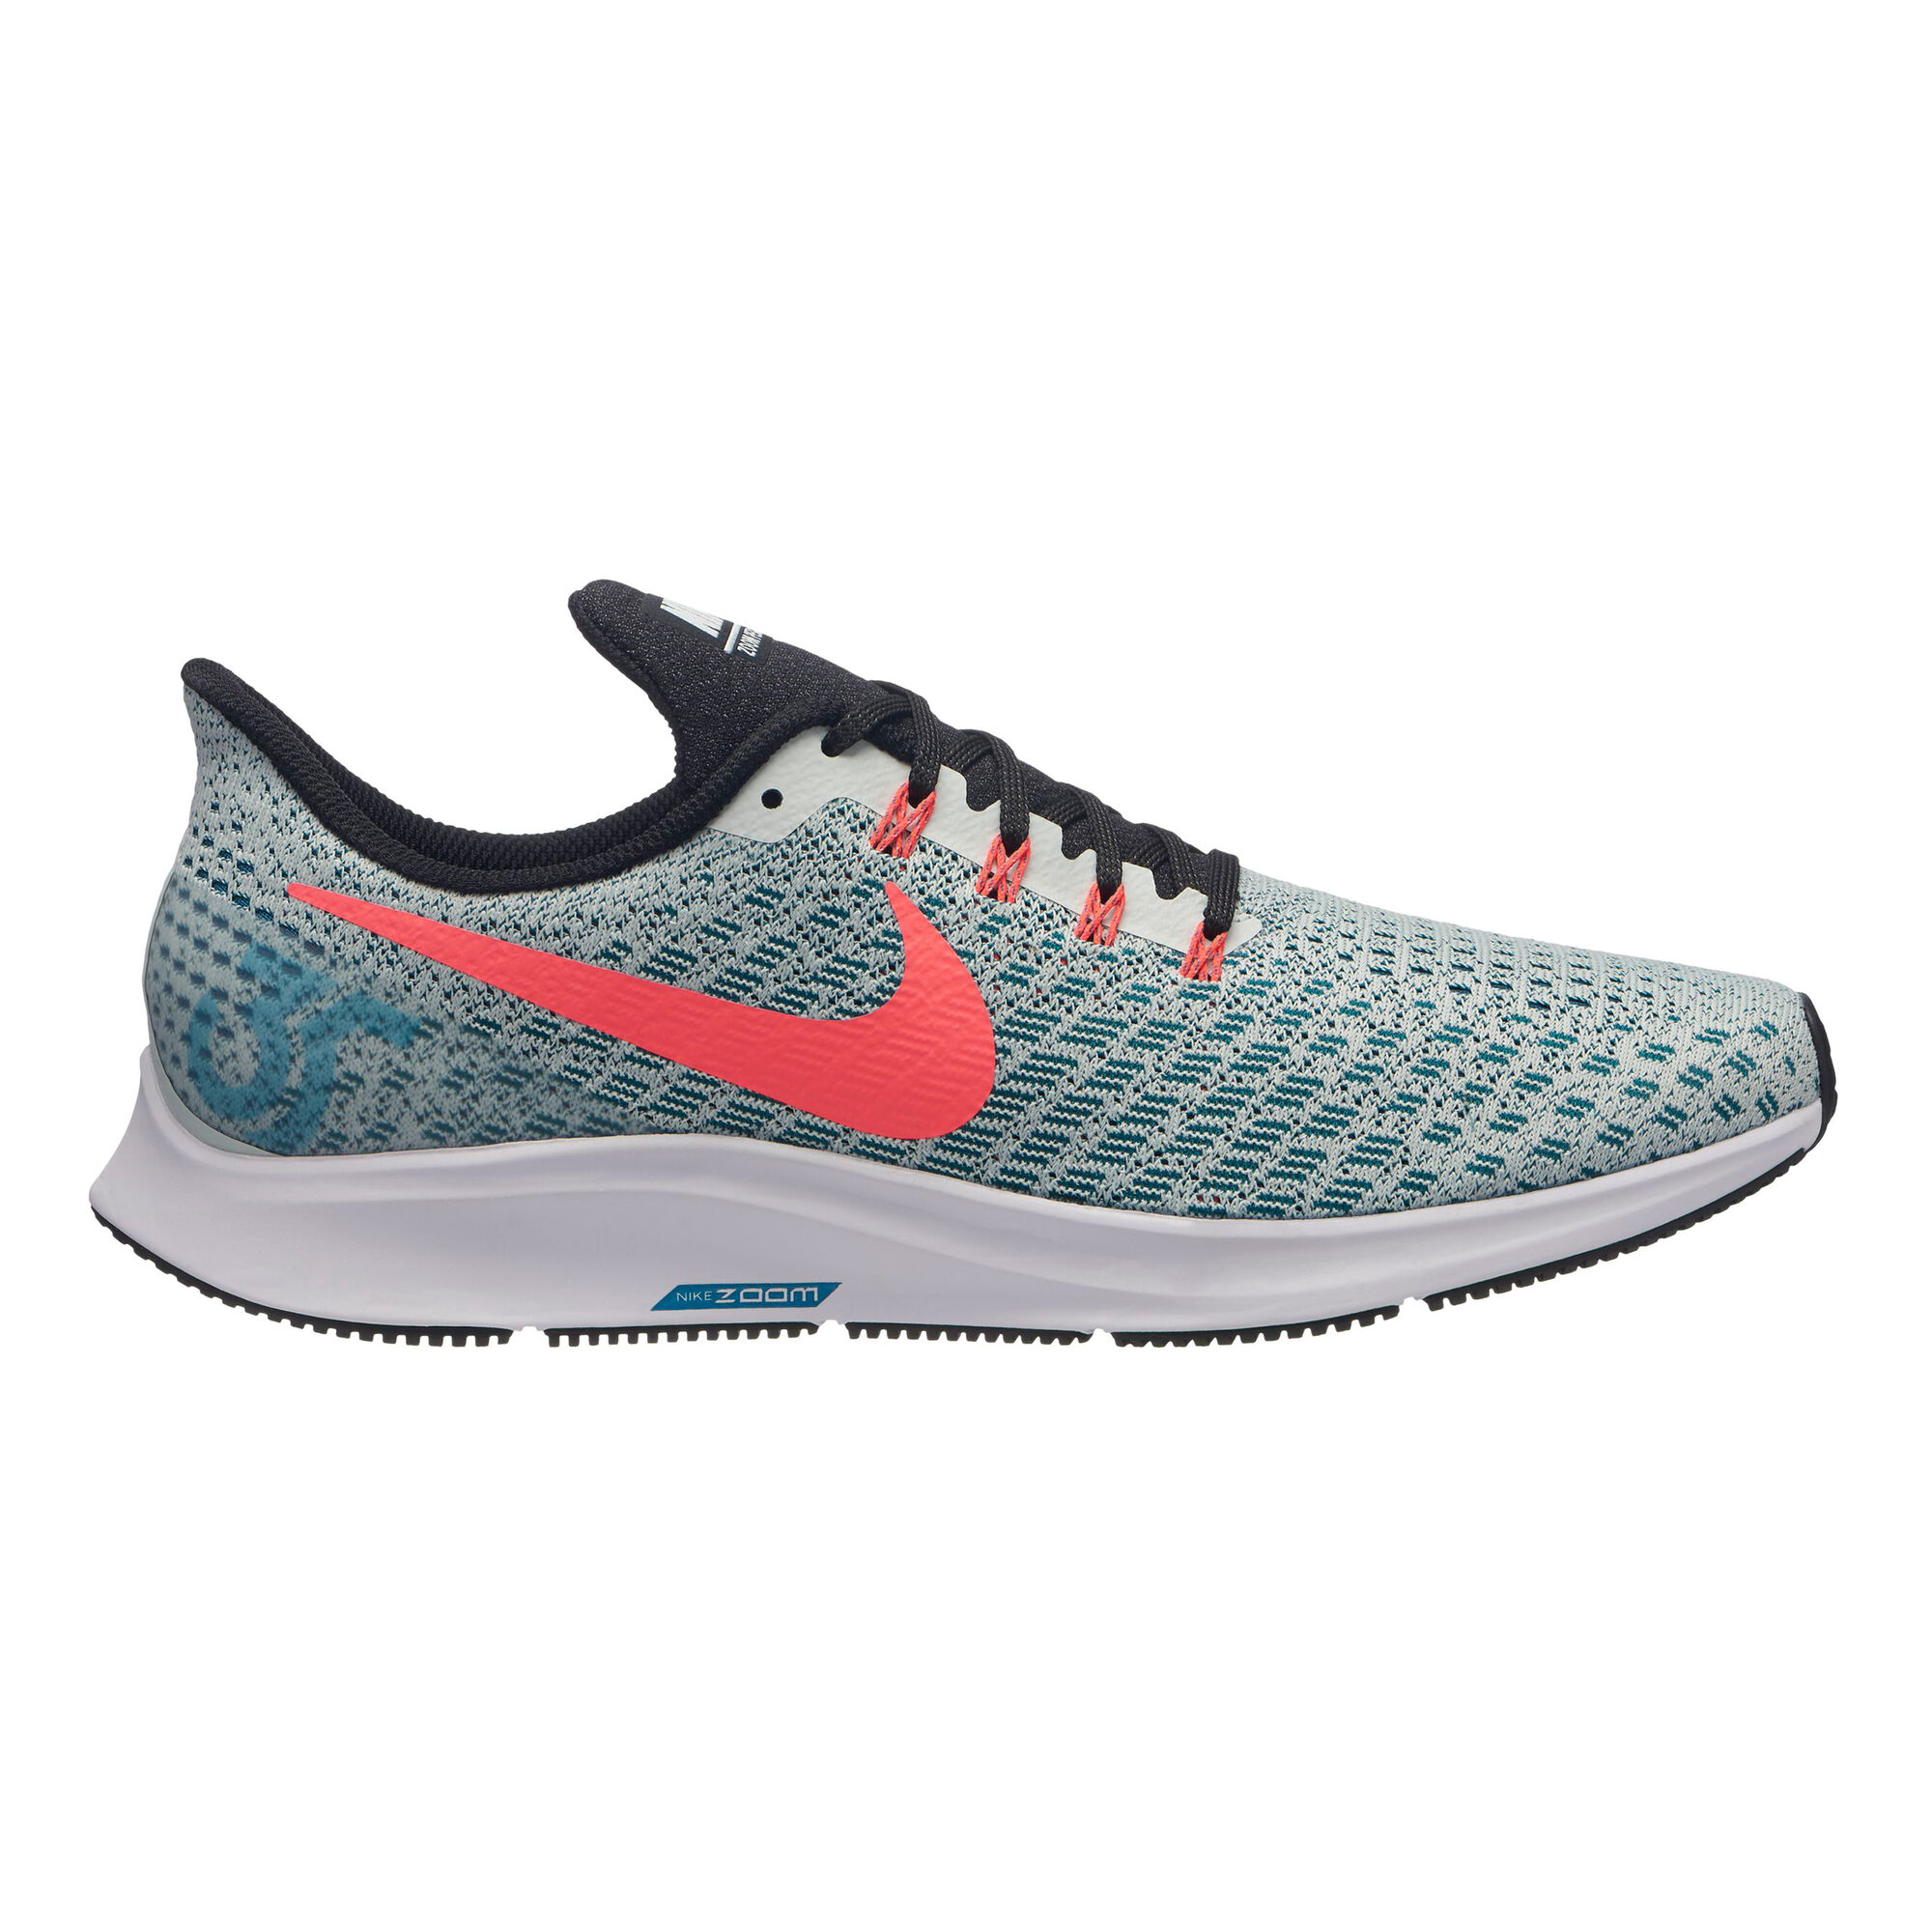 4448a263822 buy Nike Air Zoom Pegasus 35 Neutral Running Shoe Men - Grey